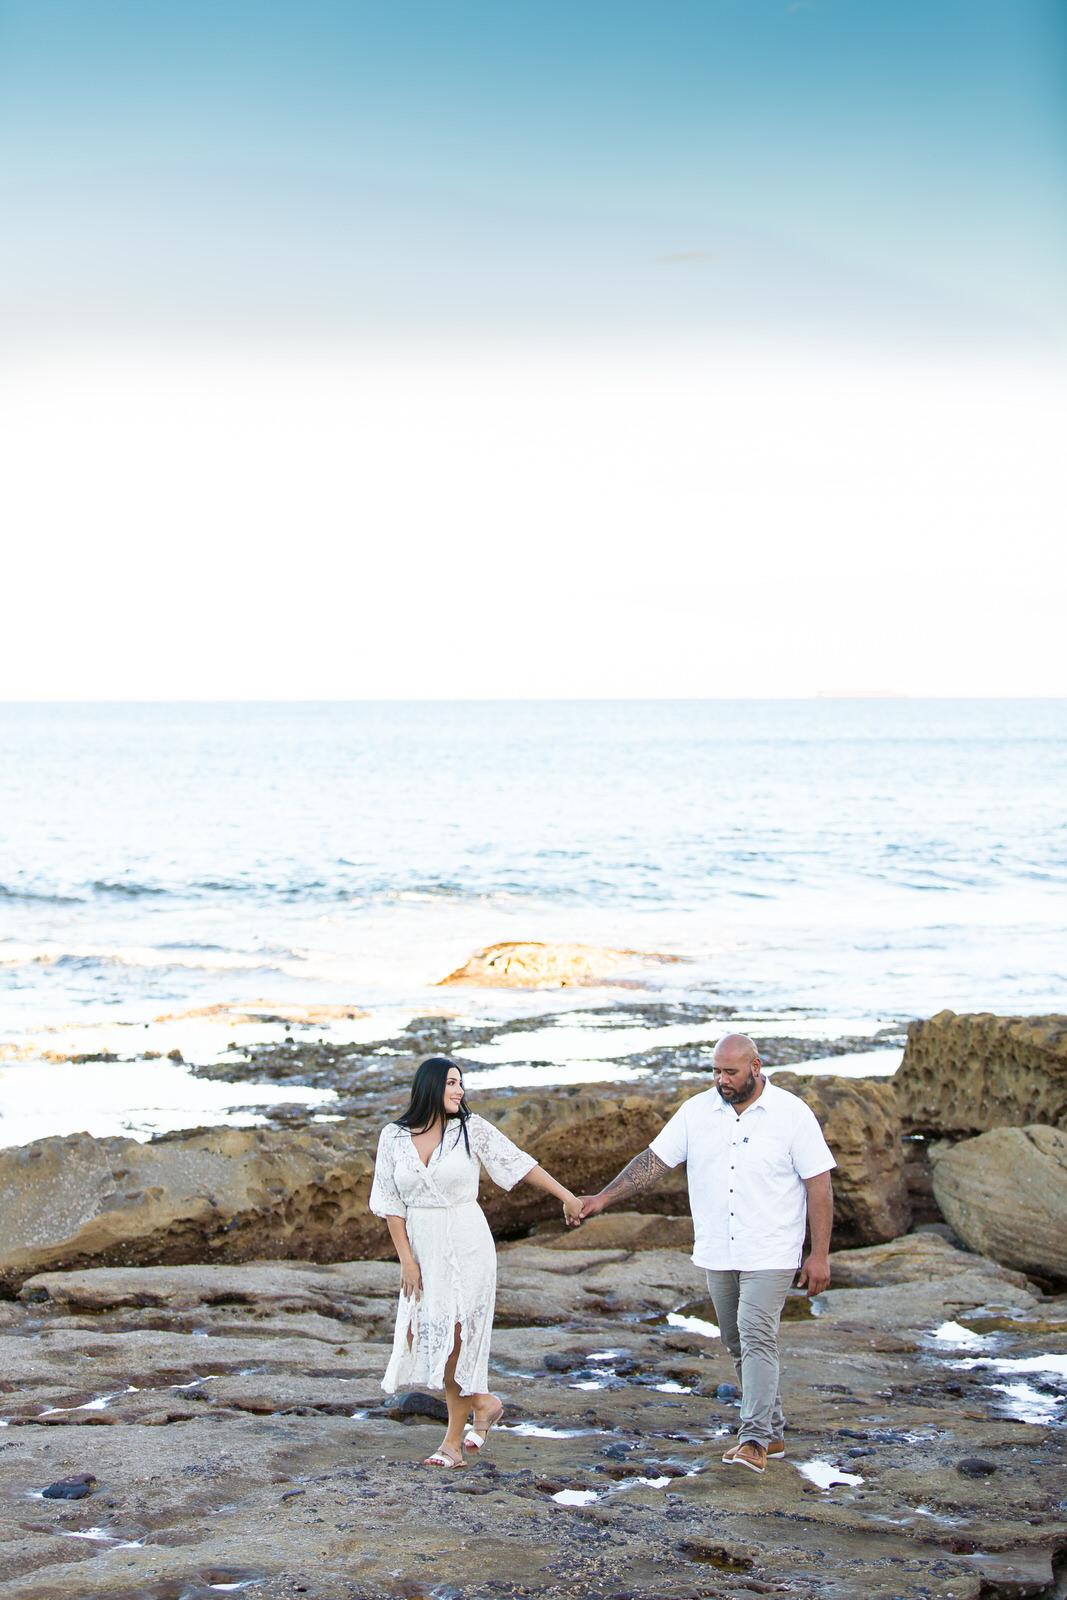 Sydney Wedding Photographer - Maroubra Beach - Jennifer Lam Photography (12).jpg